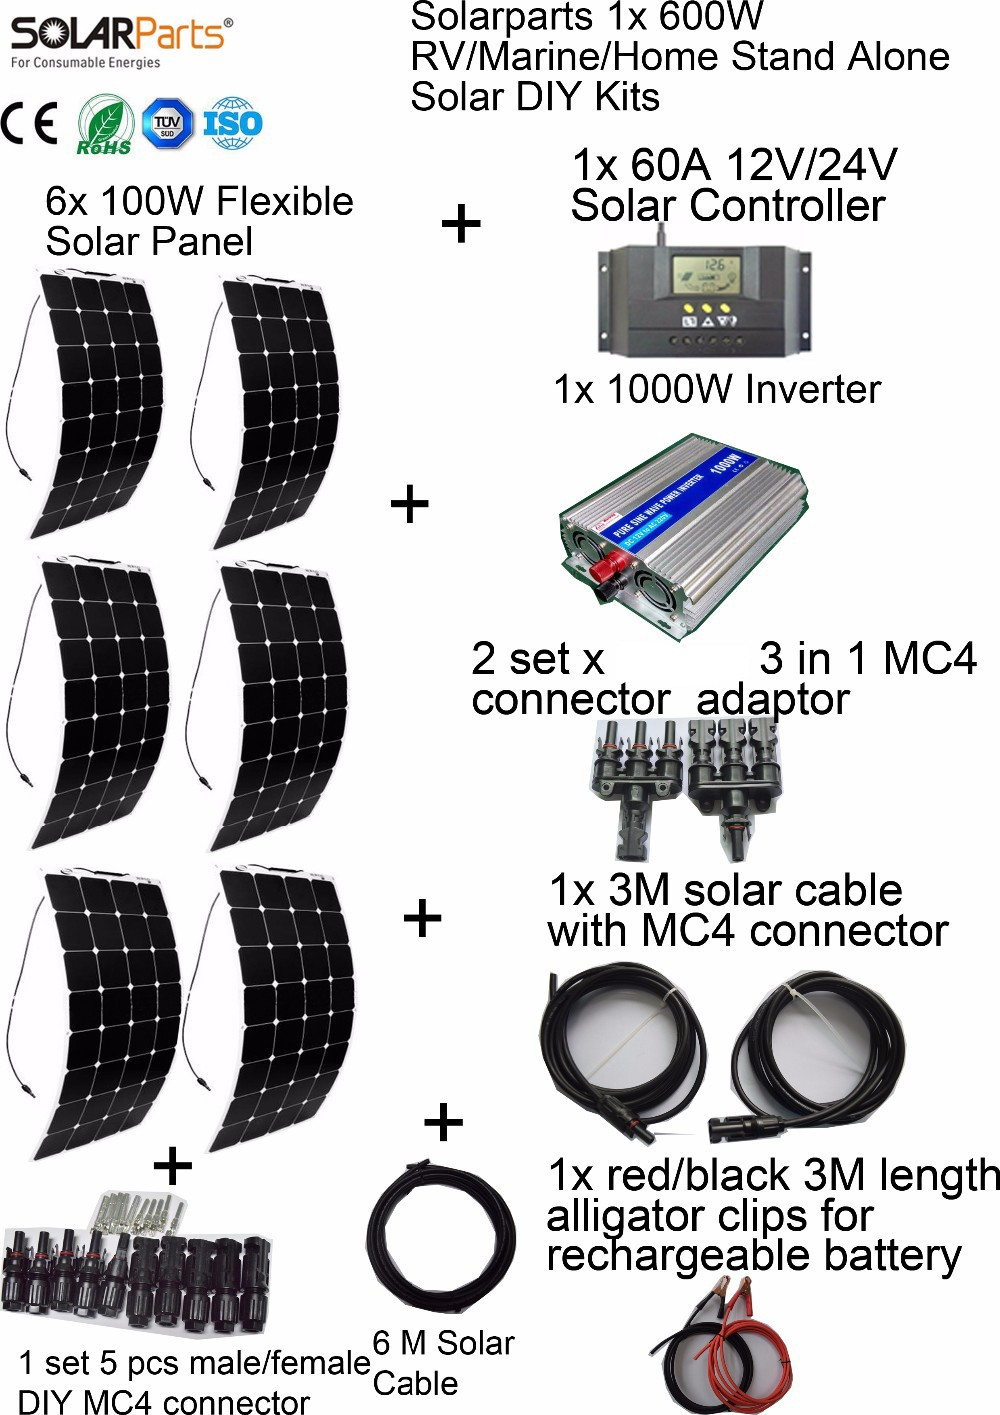 Solarparts 6x100W Solar System KITS flexible solar panel